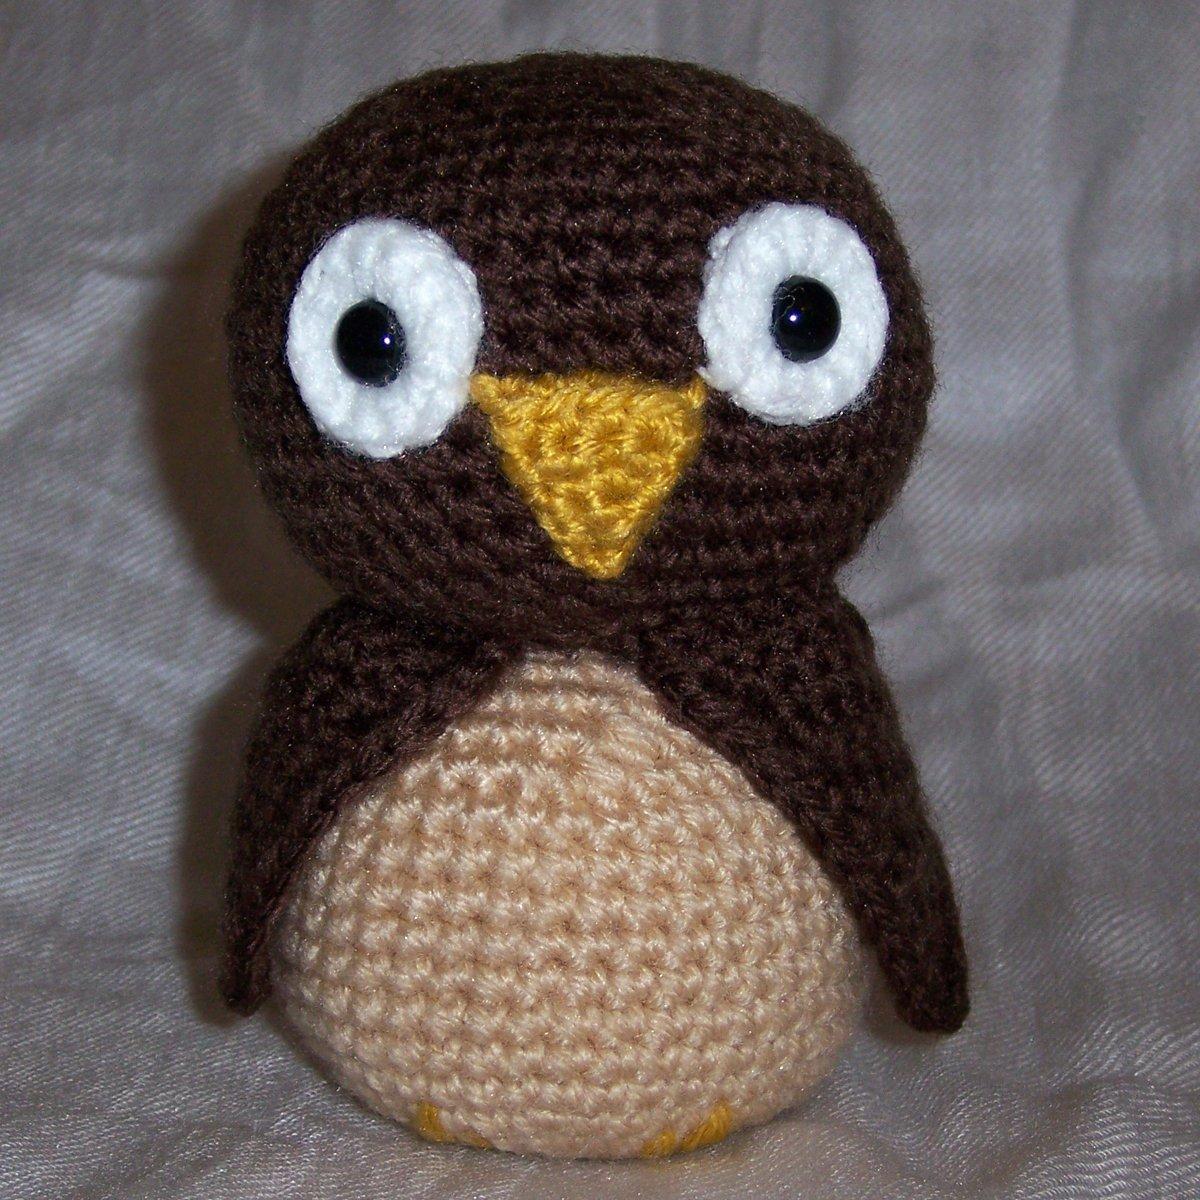 amigurumi OWL - brown - cute crochet stuffed toy animal